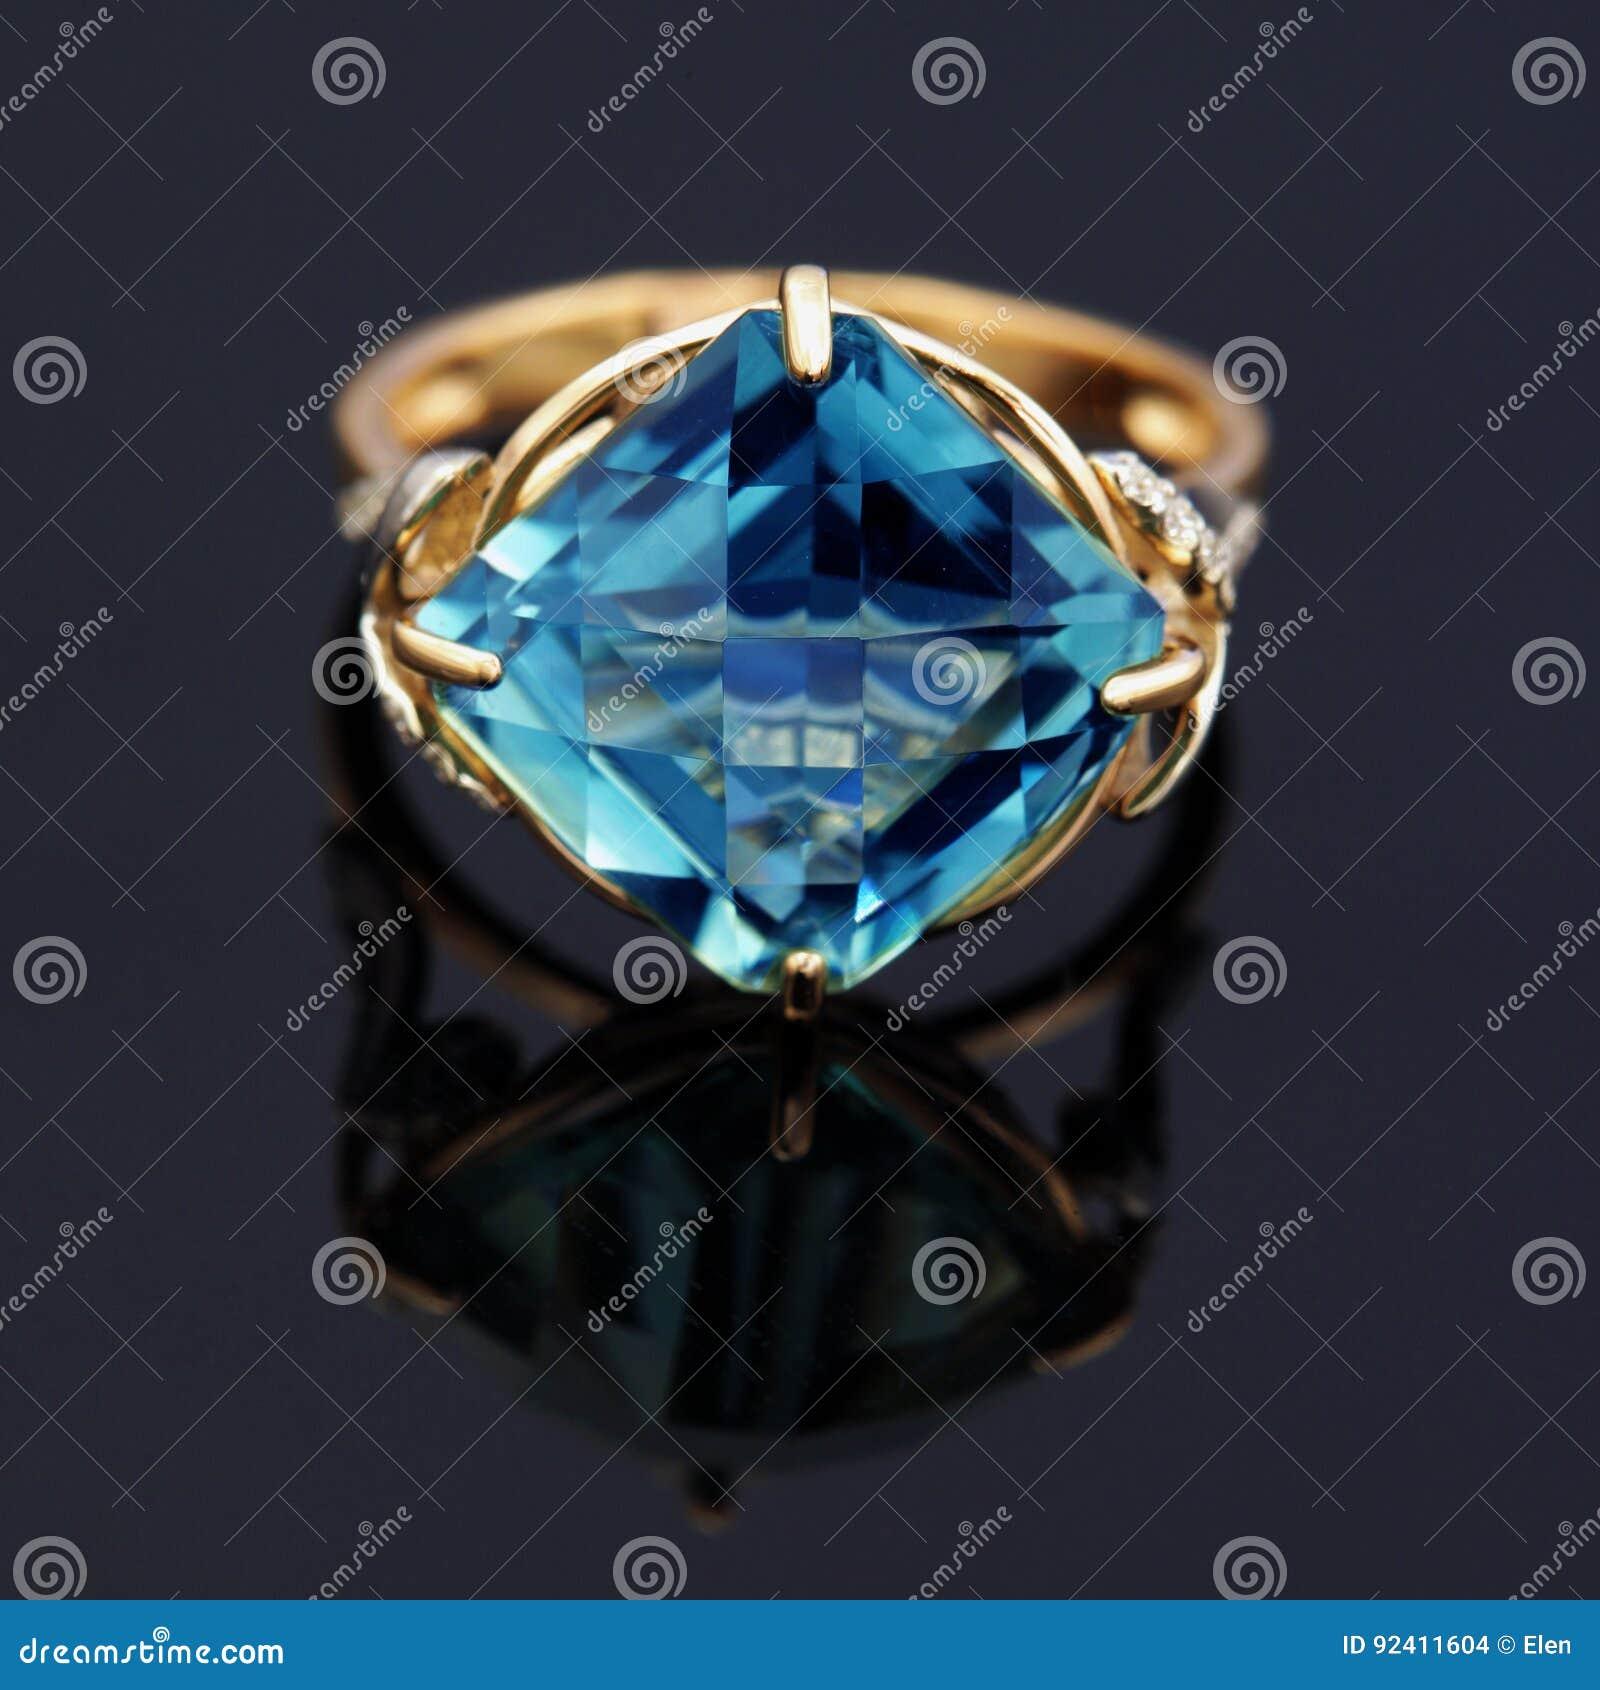 Elegant jewelry ring with blue topaz